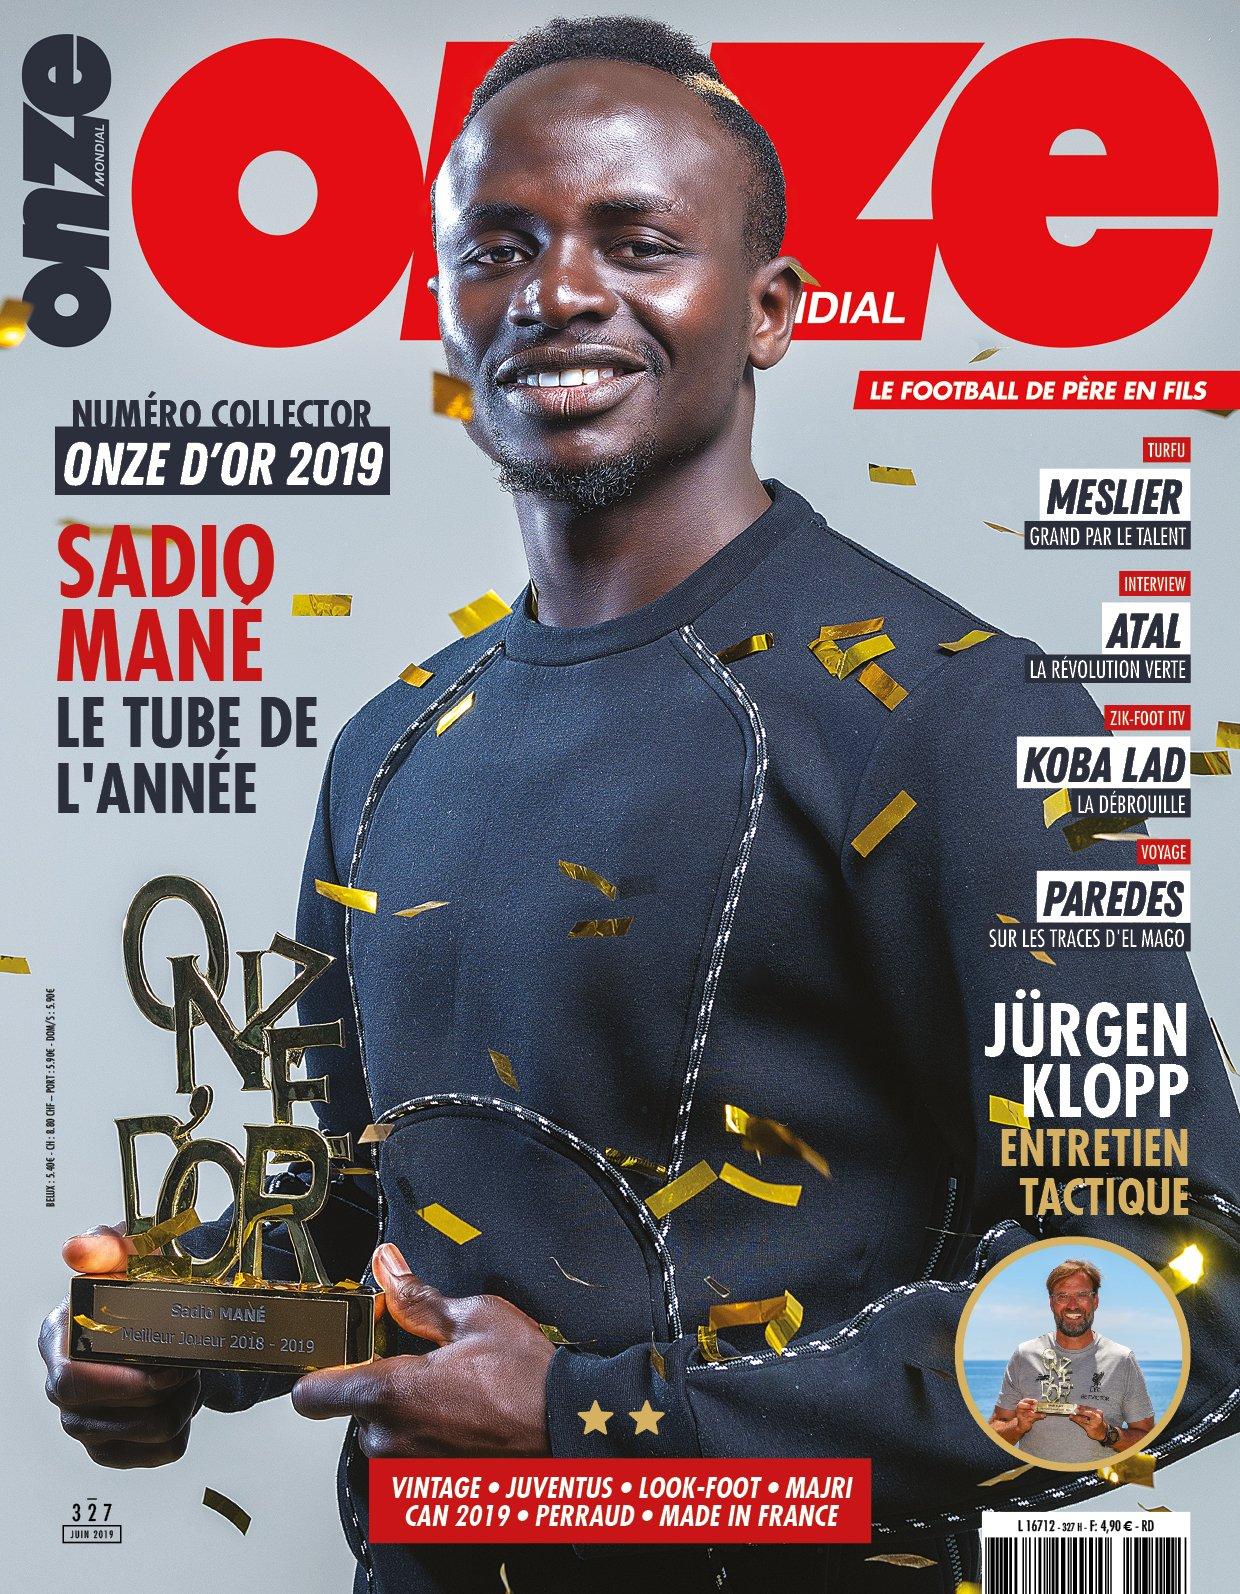 Onze-Mondial-Magazine-Juin-327-sadio mané